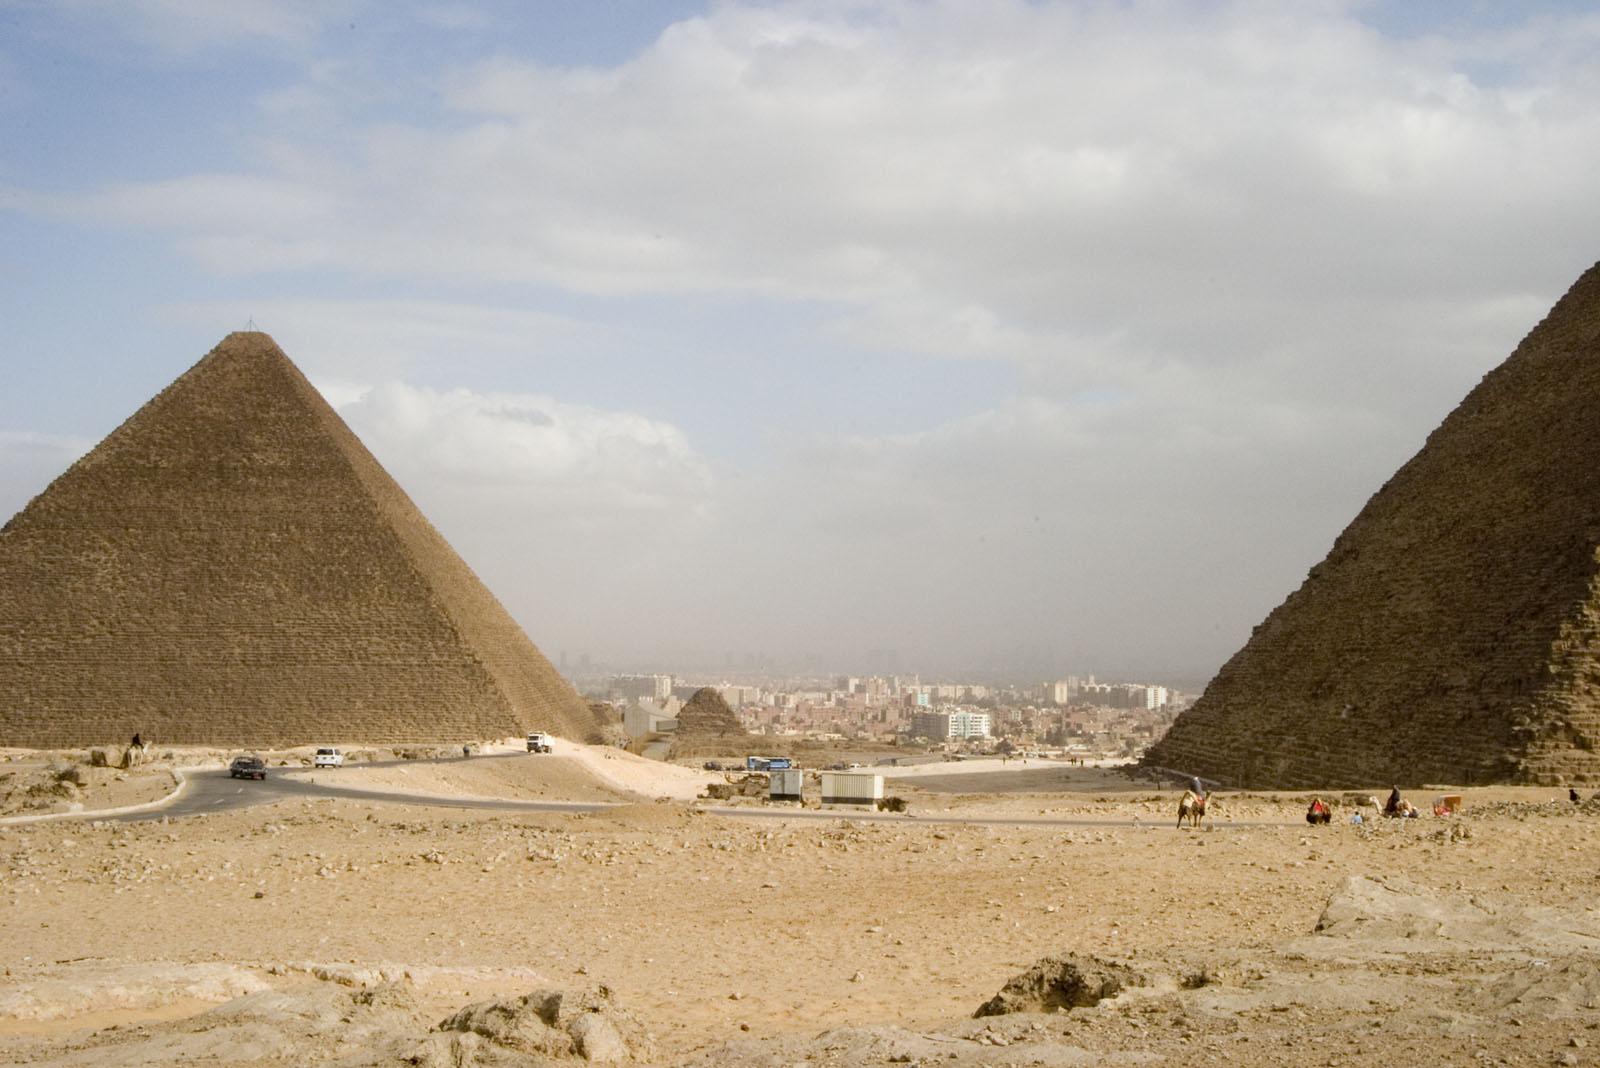 Western Cemetery: Site: Giza; View: Khufu pyramid, Khafre pyramid